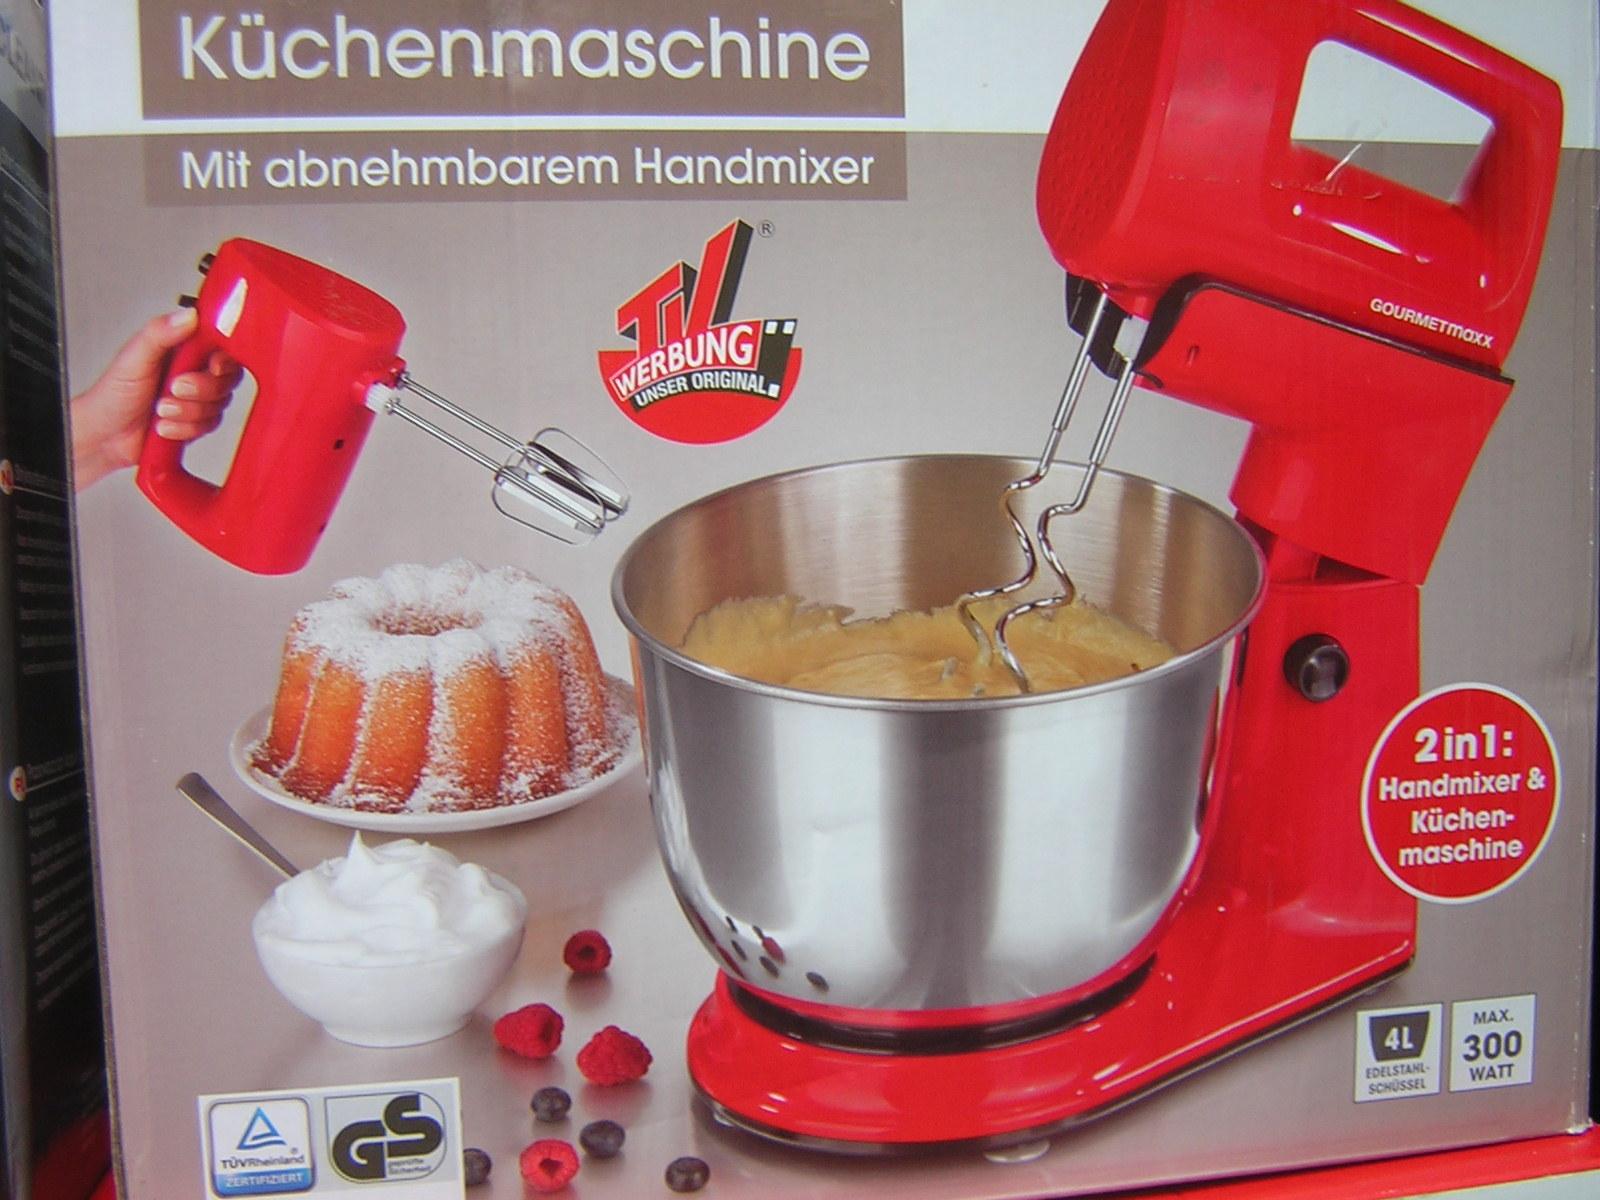 Shop24 Intervers Gourmetmaxx Kuchenmaschine 2in1